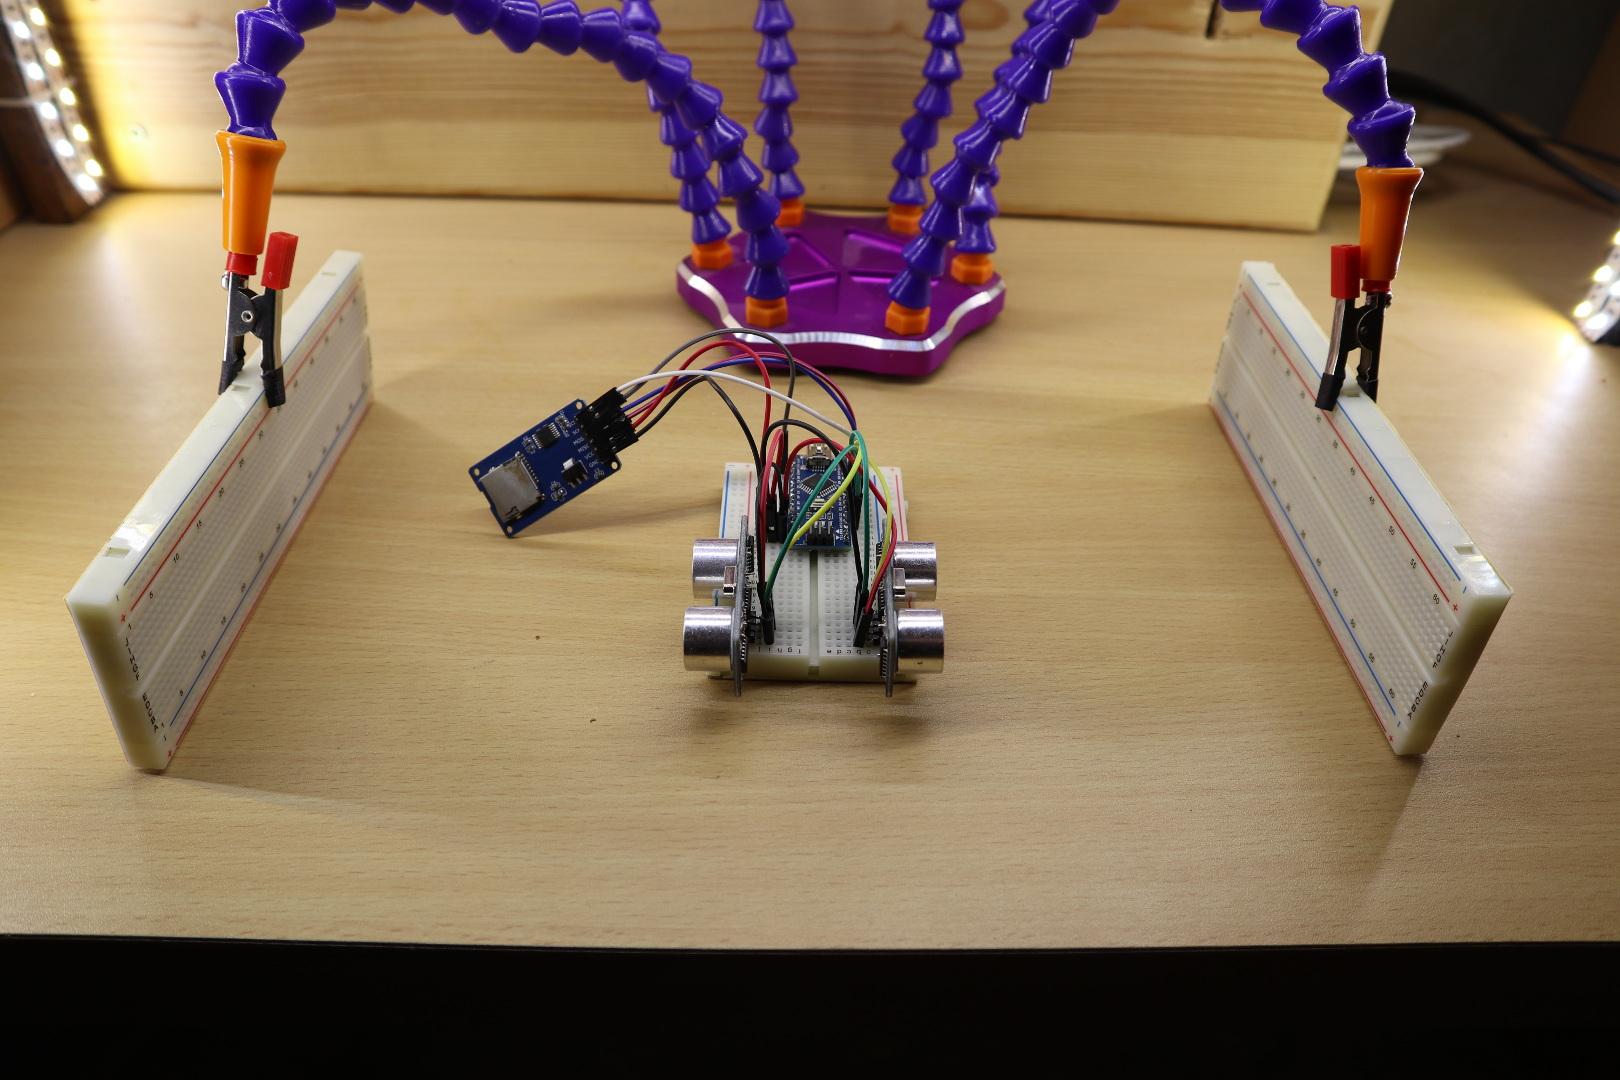 How to do statistics with an Arduino? (Arduino -> SD card -> R